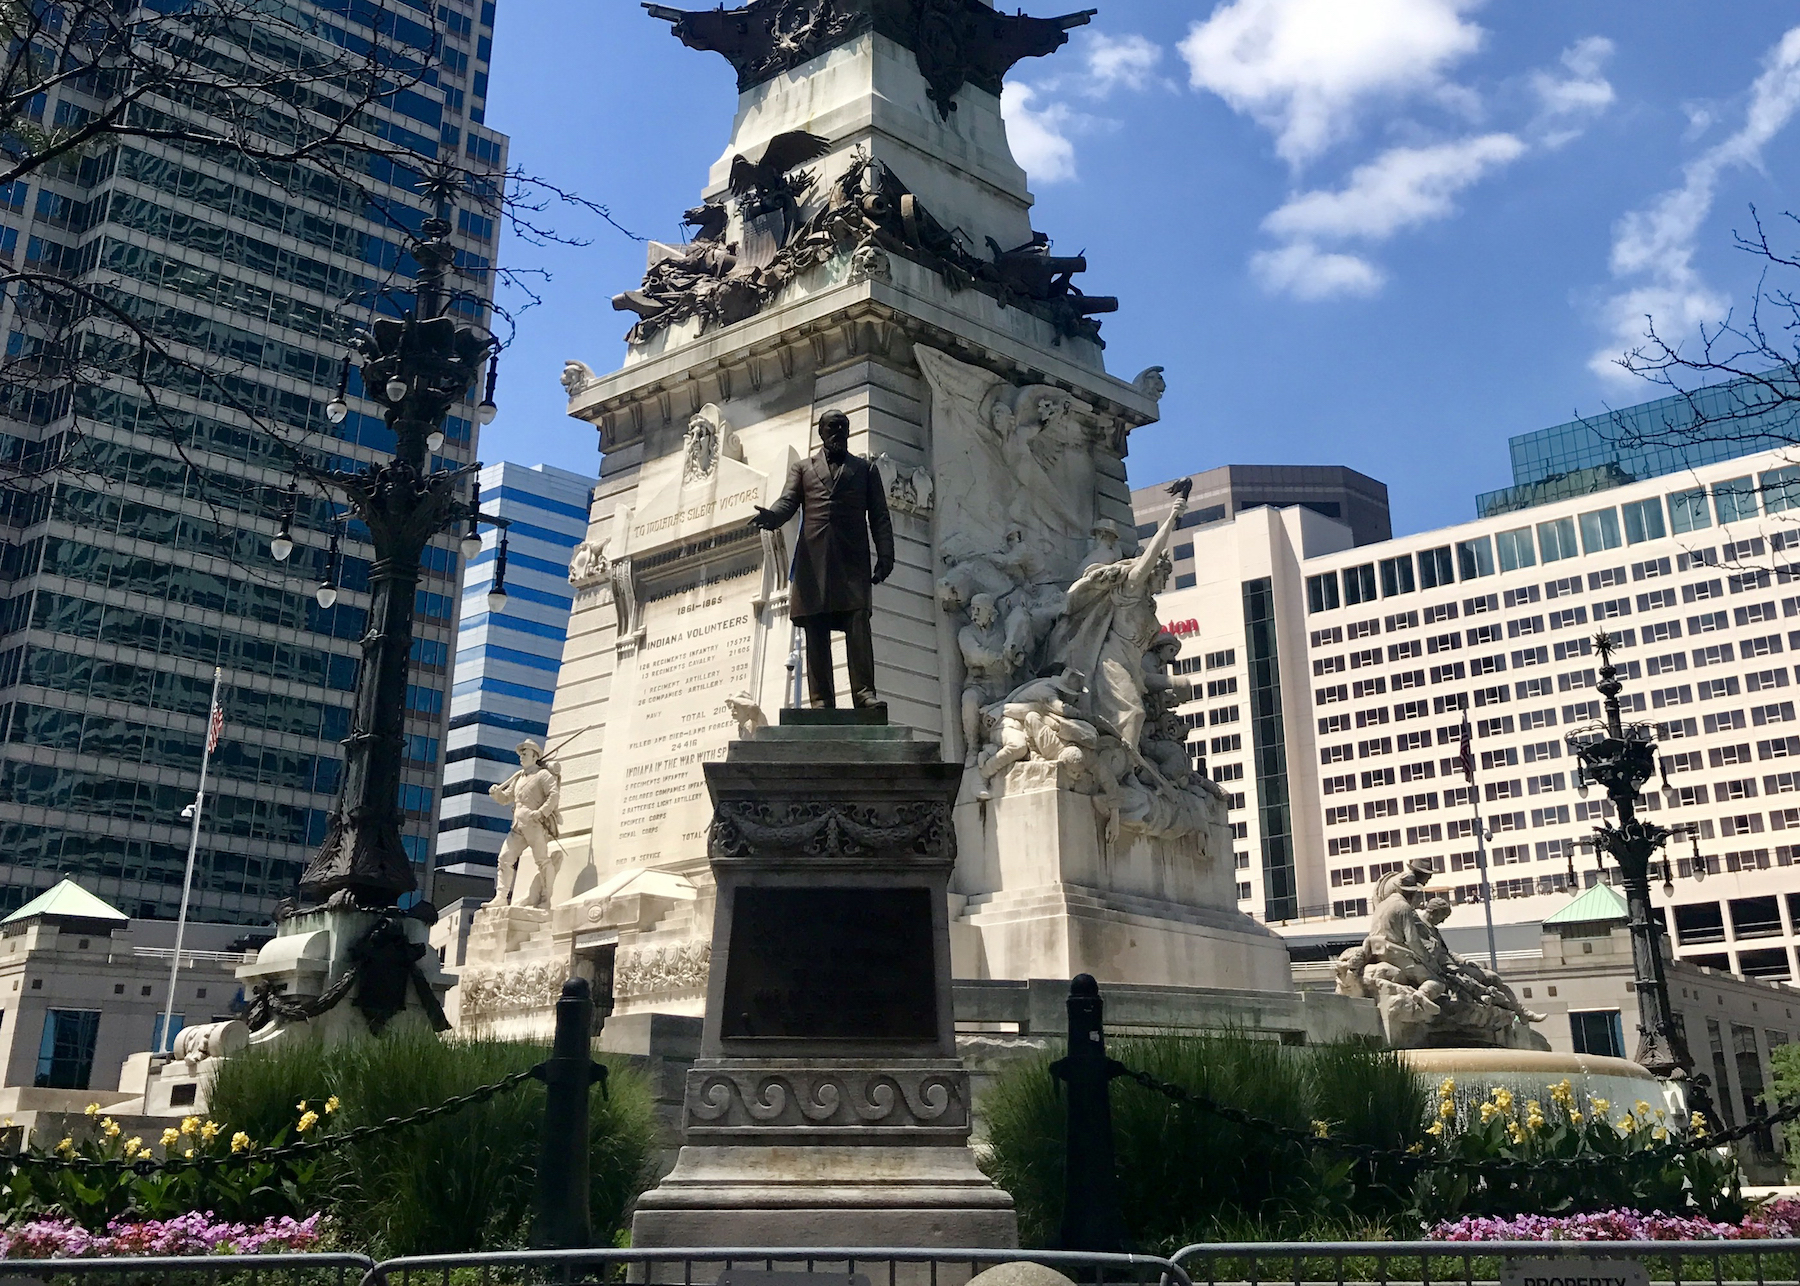 soldiers-and-sailors-memorial-at-monument-circle